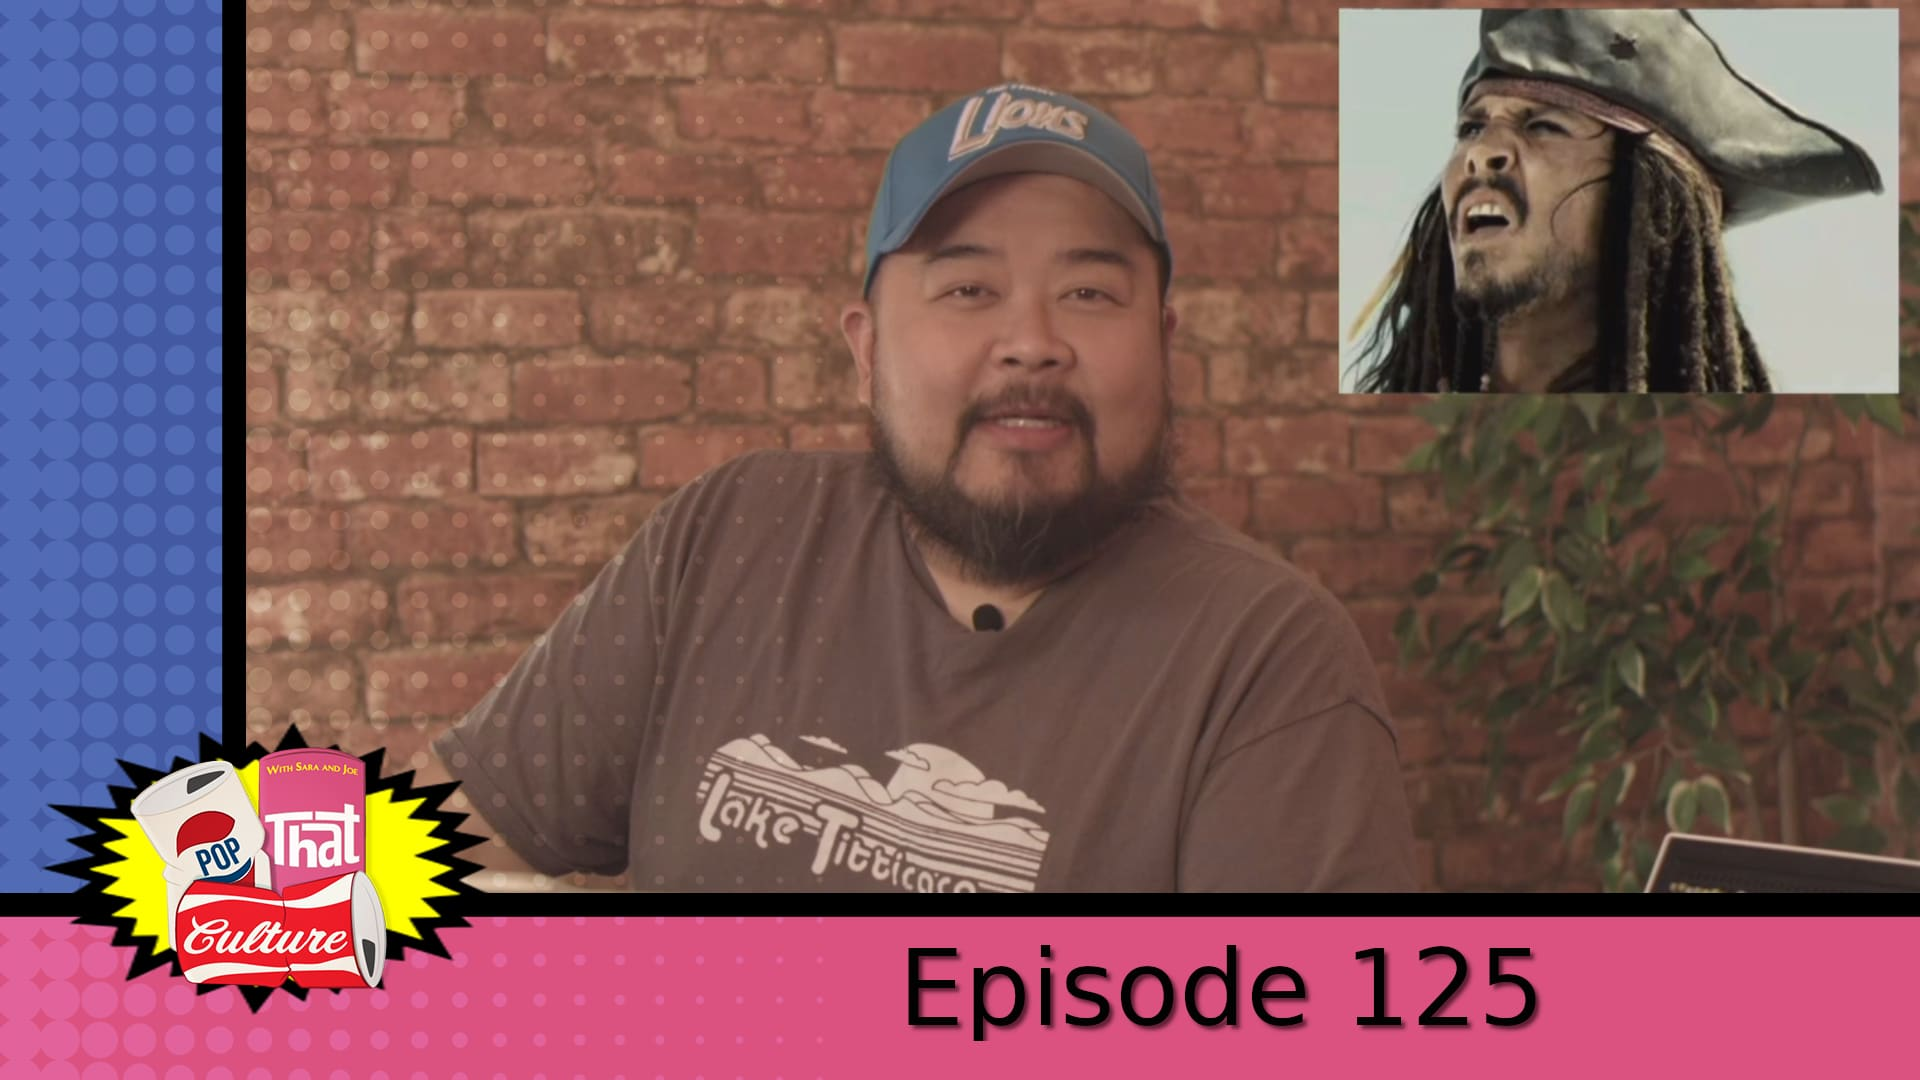 Pop That Culture - Episode 125